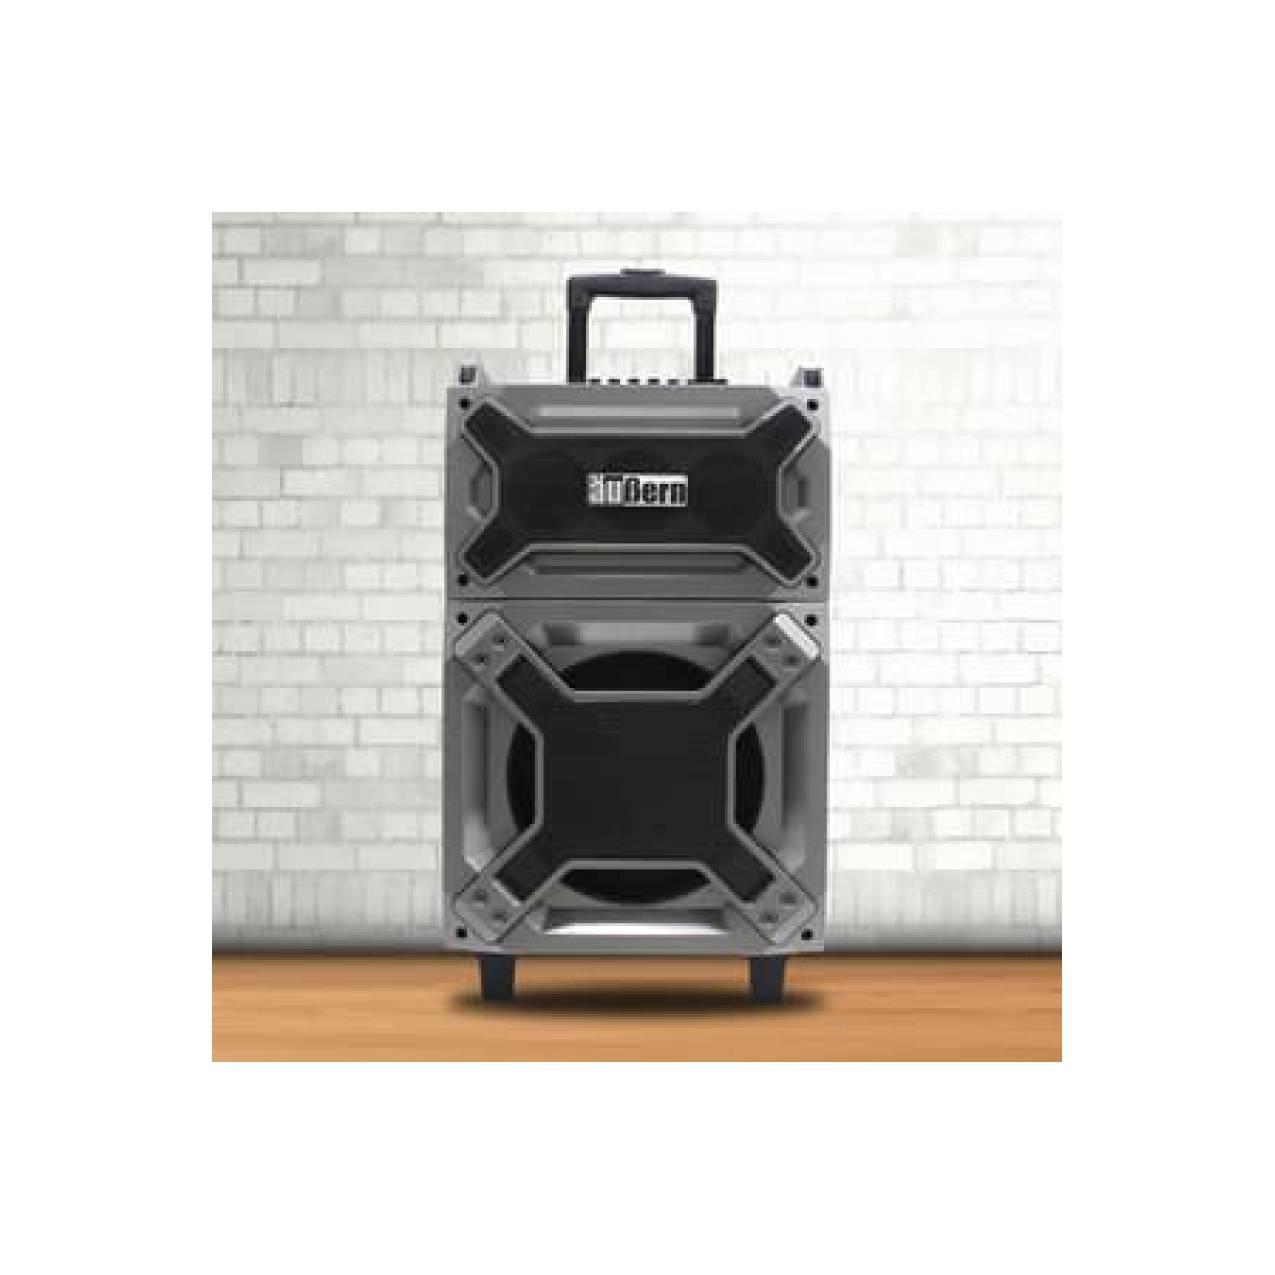 Aubern GX100 Portable Amplifier SoundSystem